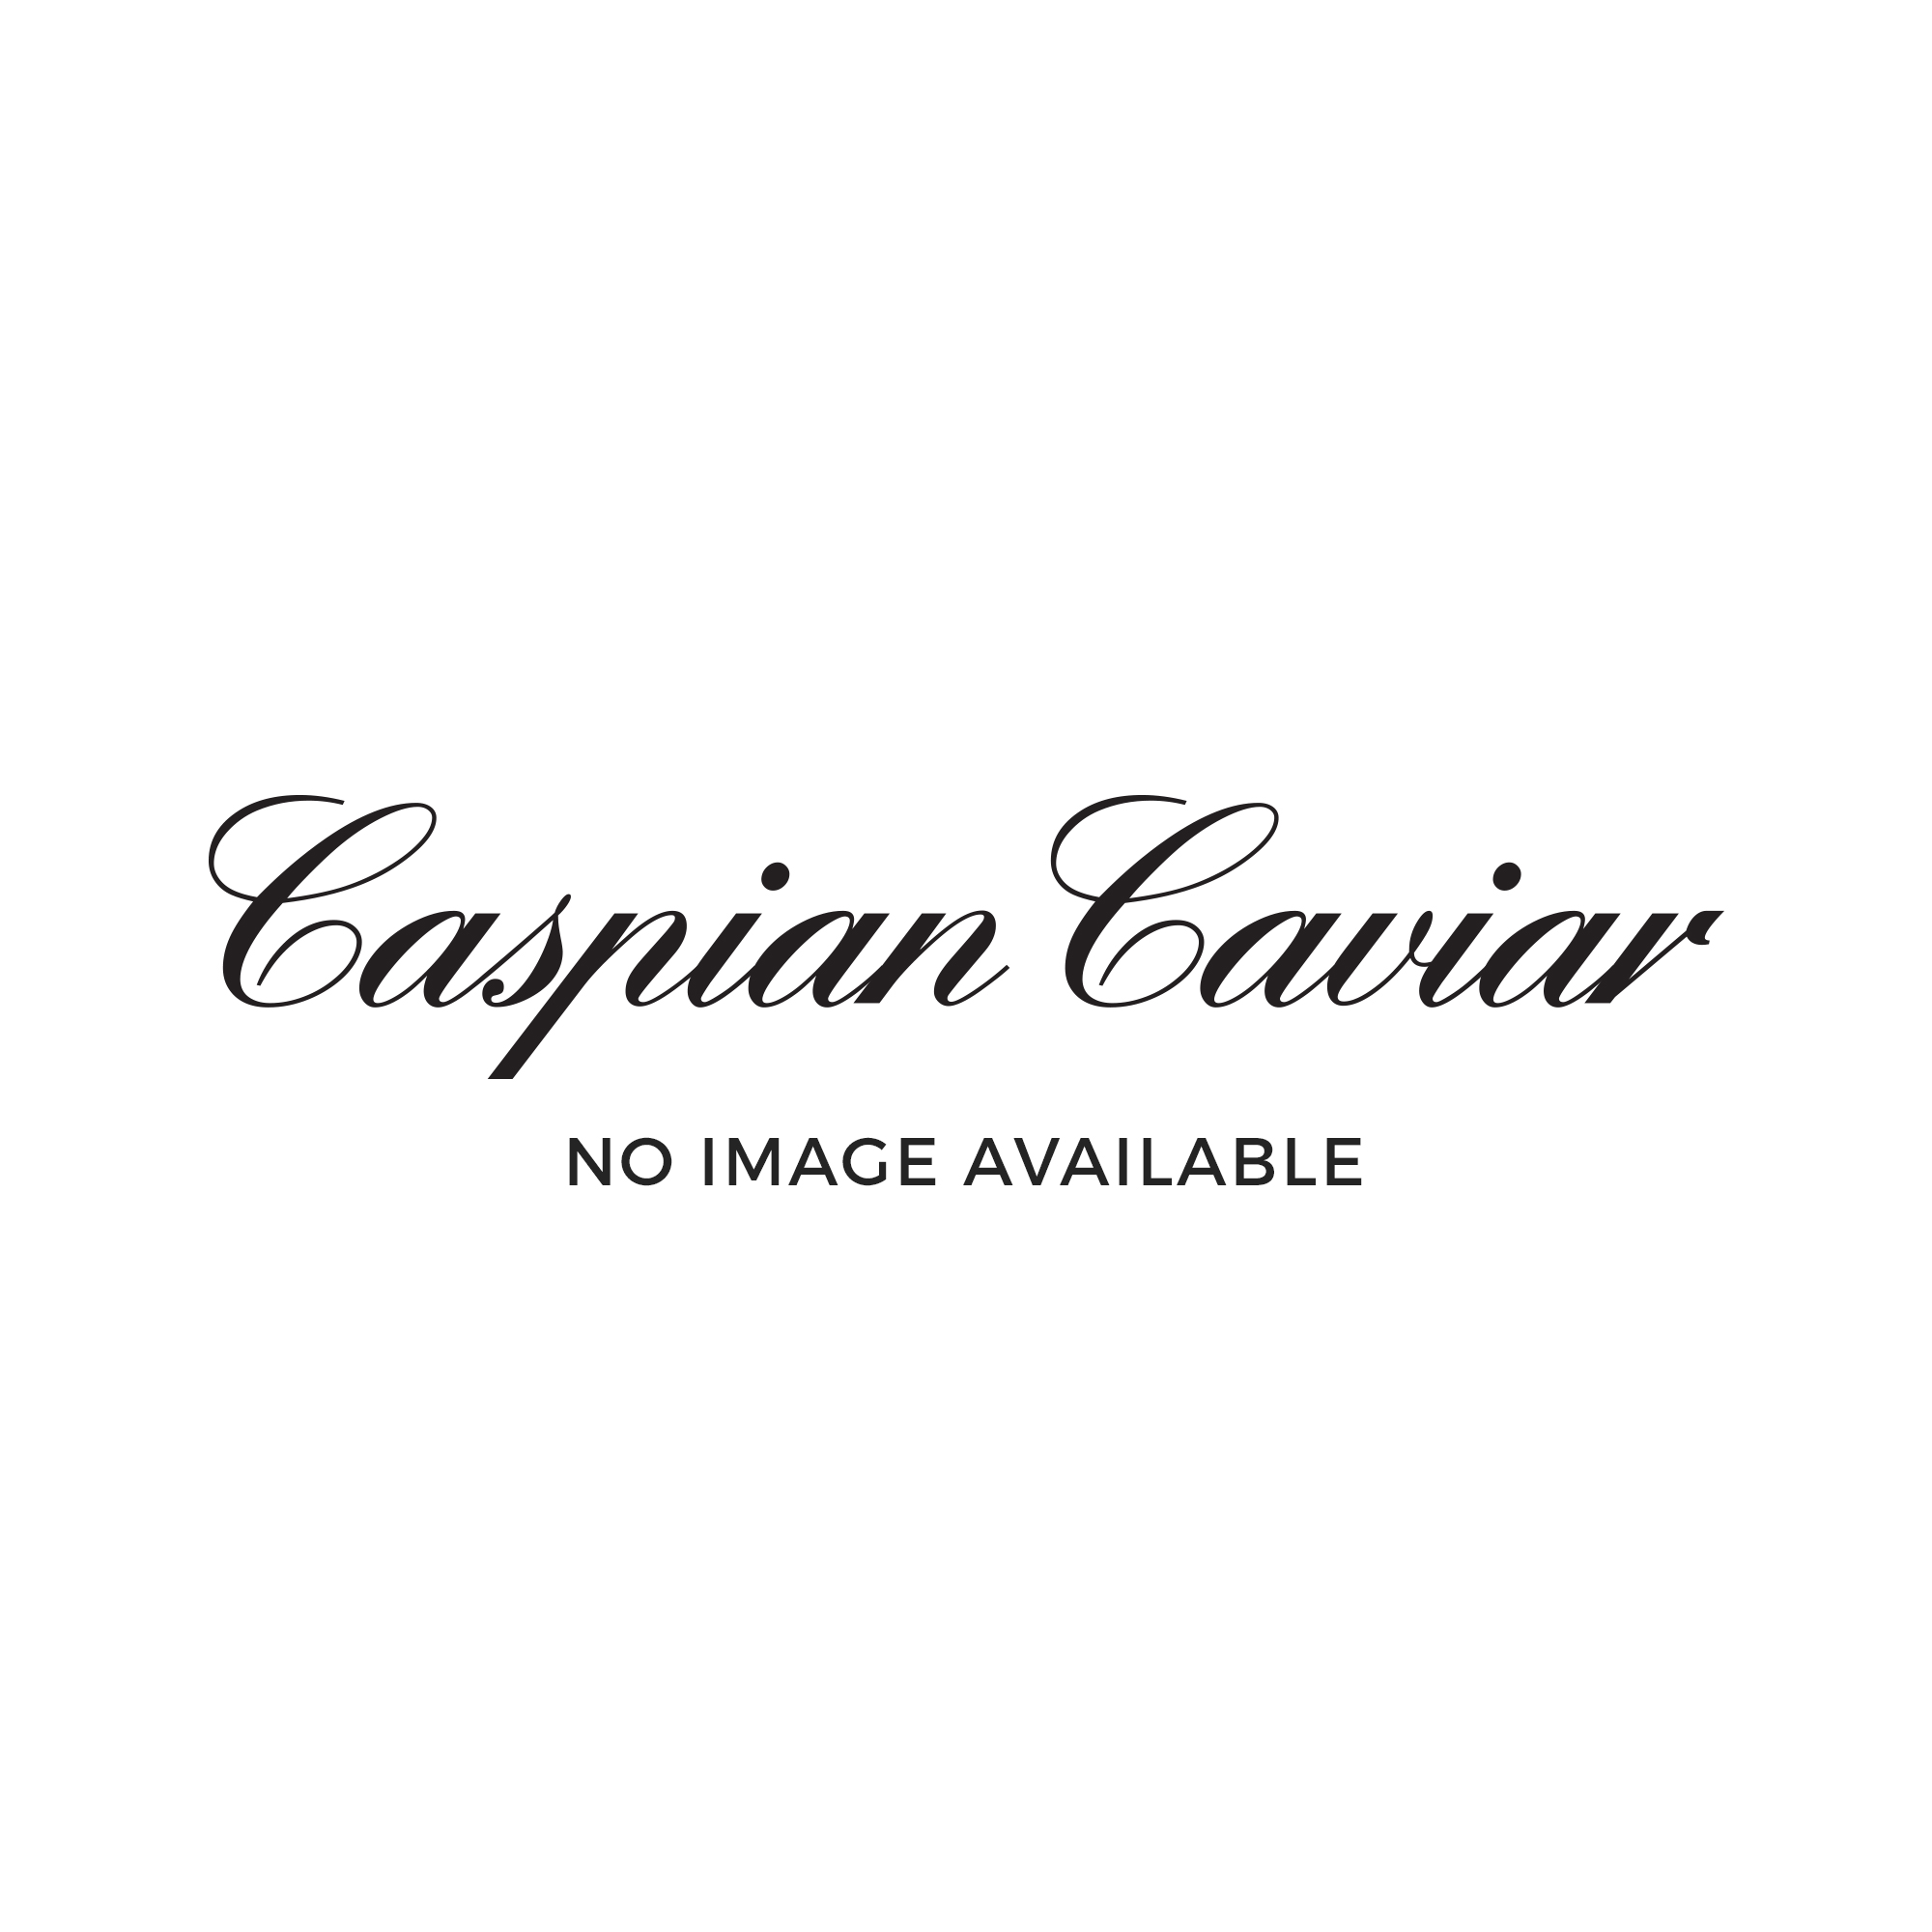 Caspian Caviar Privilege Caviar 100g